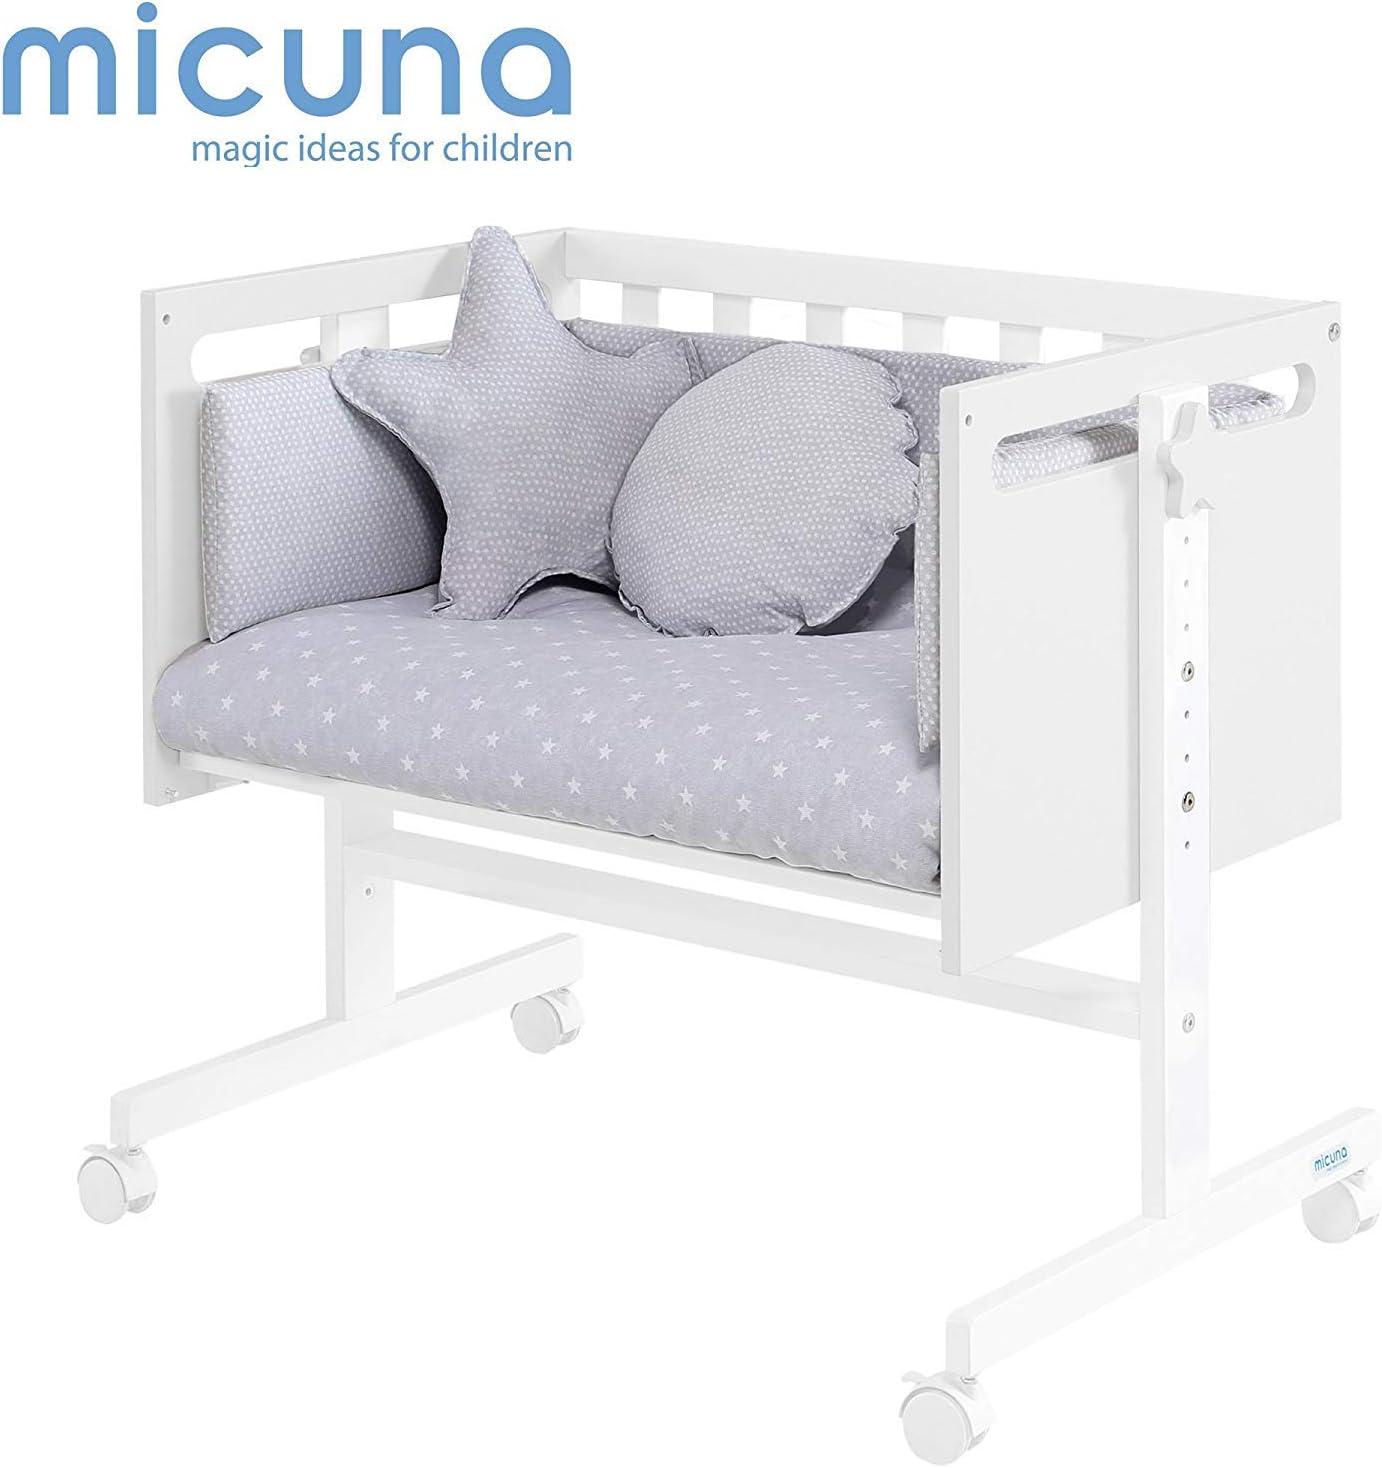 Micuna You & Me - Minicuna colecho, unisex, color blanco